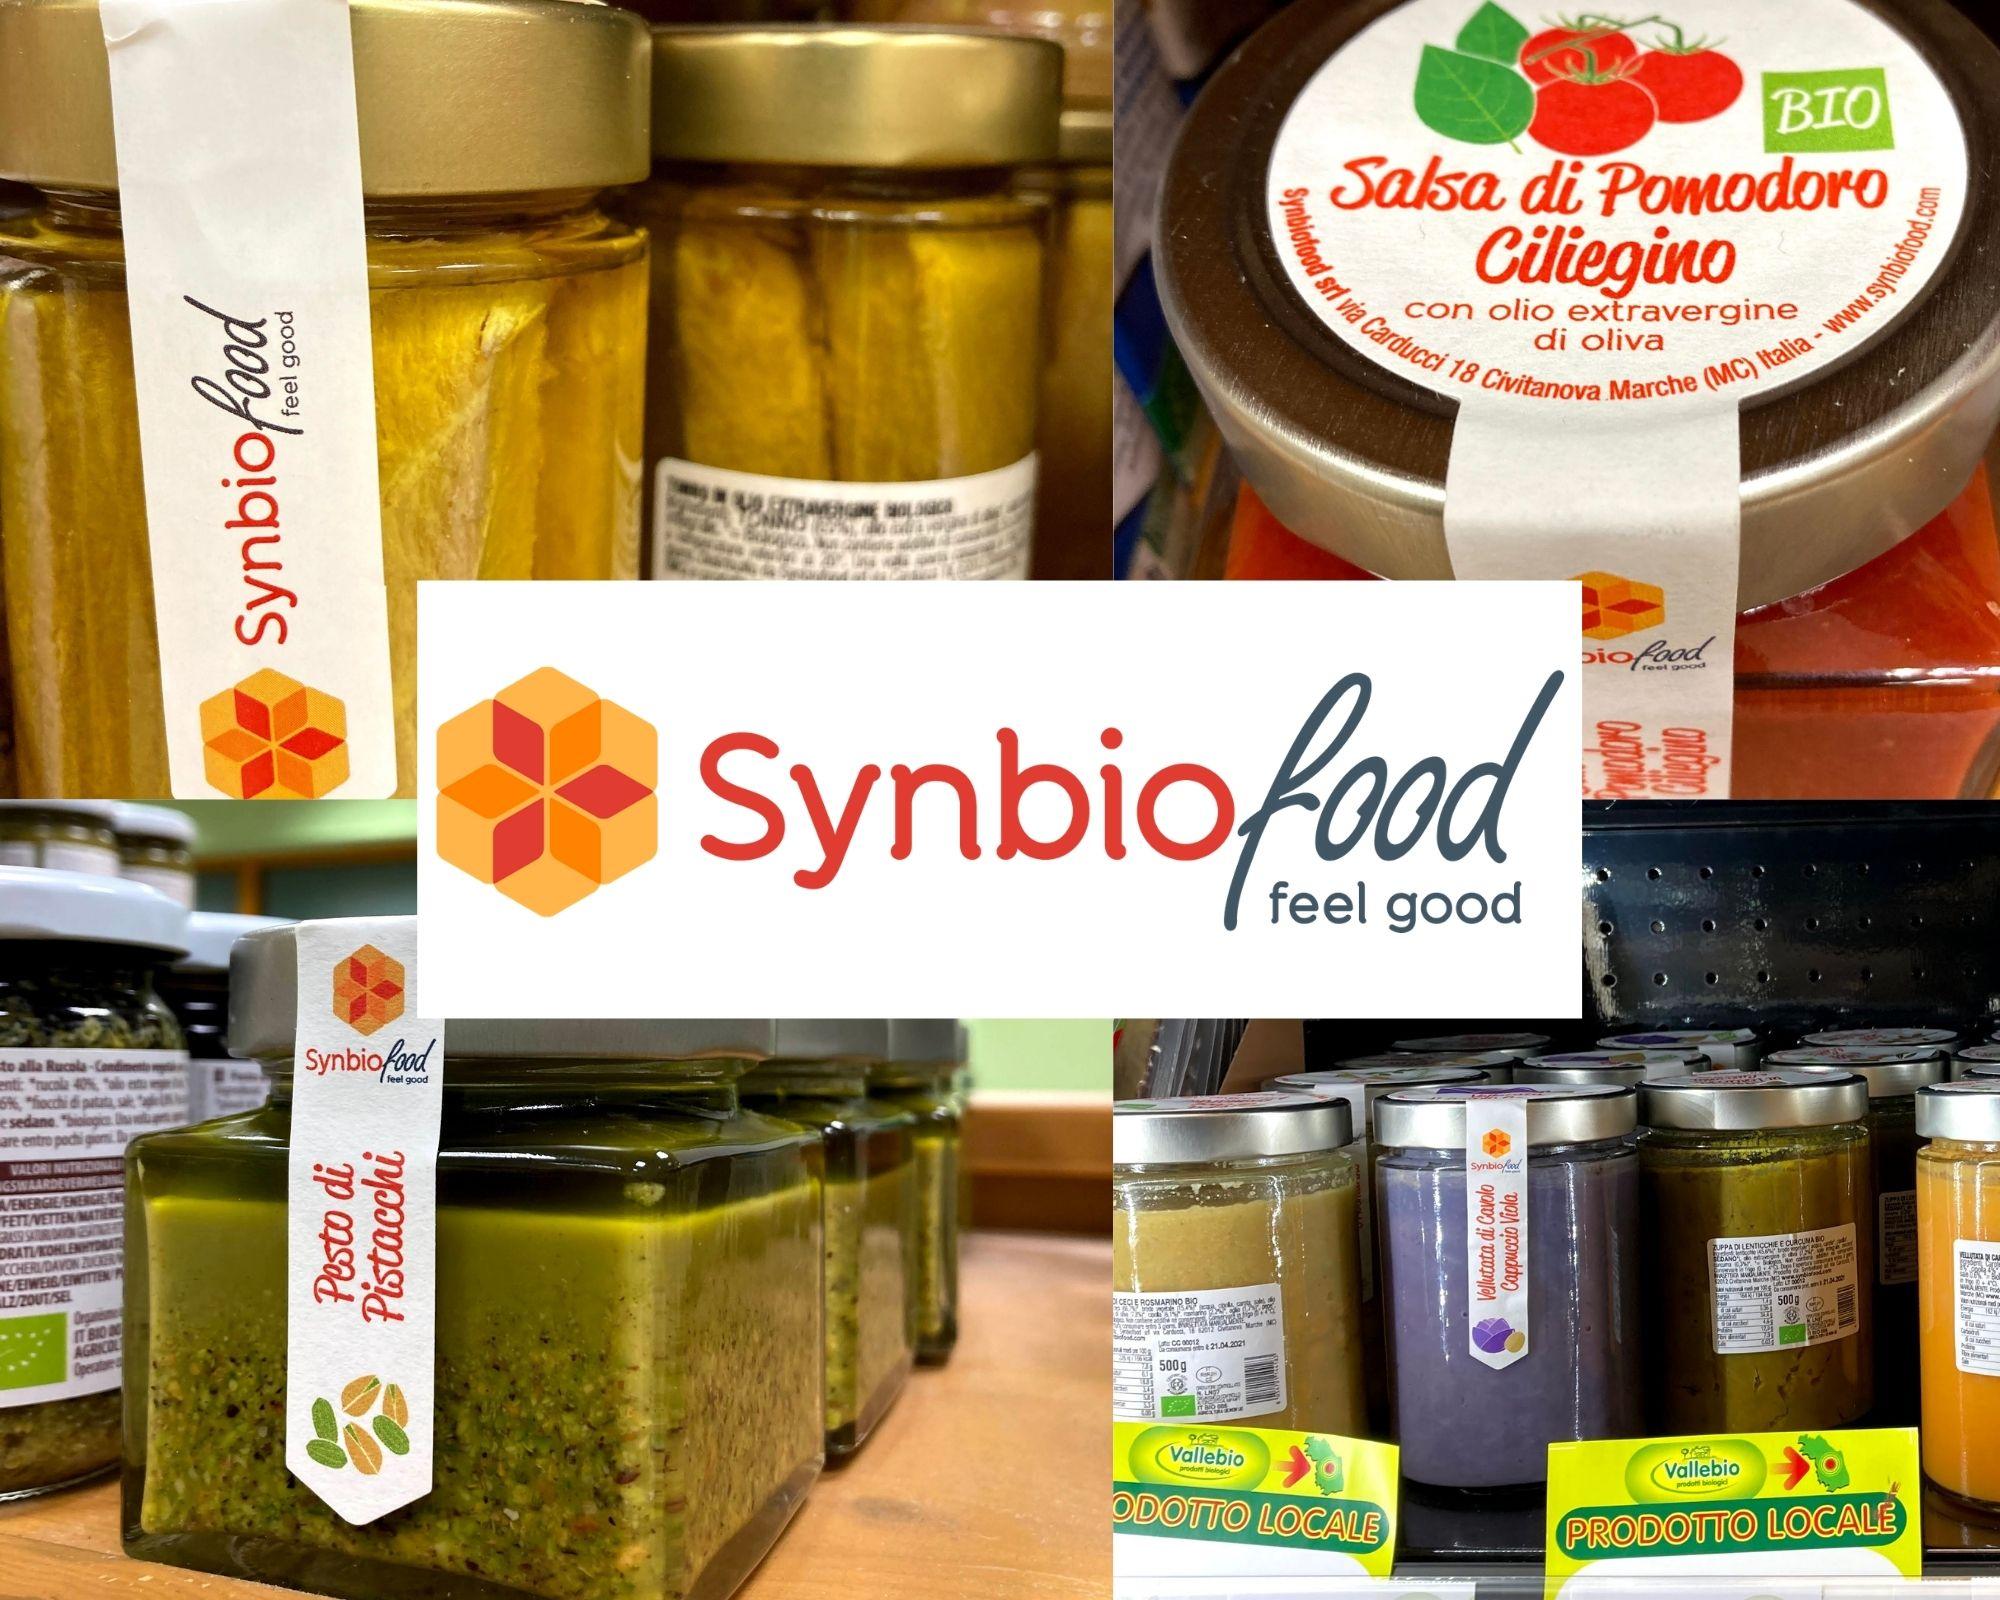 synbiofood prodotti probiotici